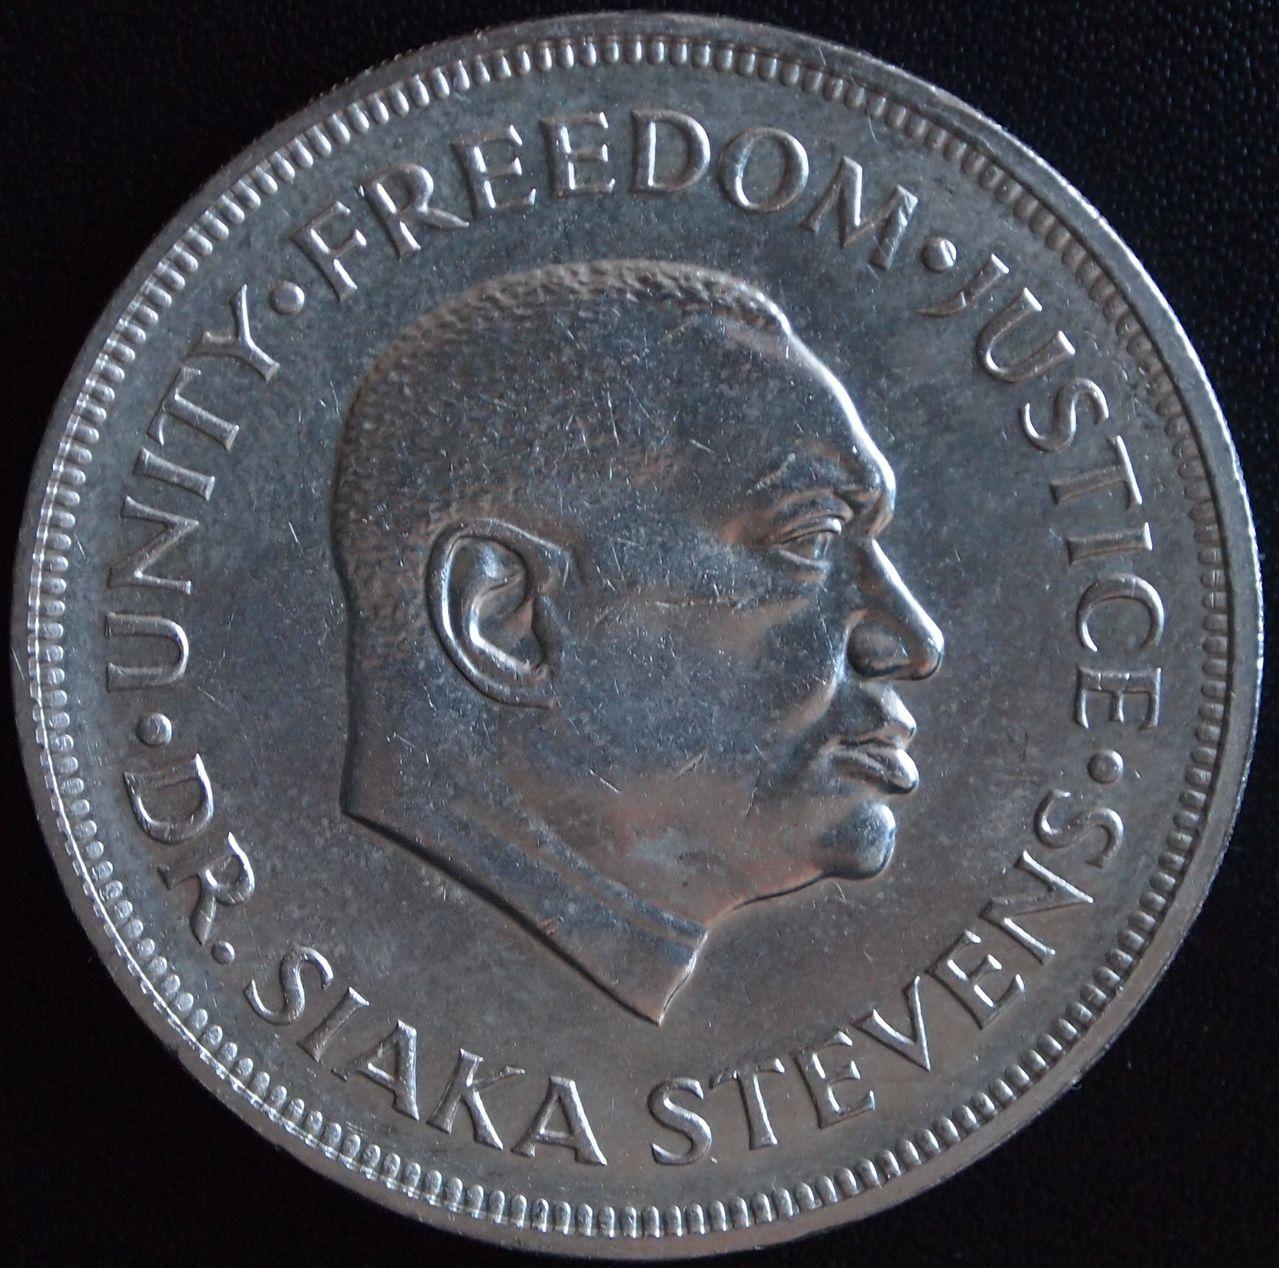 1 leone sierra leona 1974 1